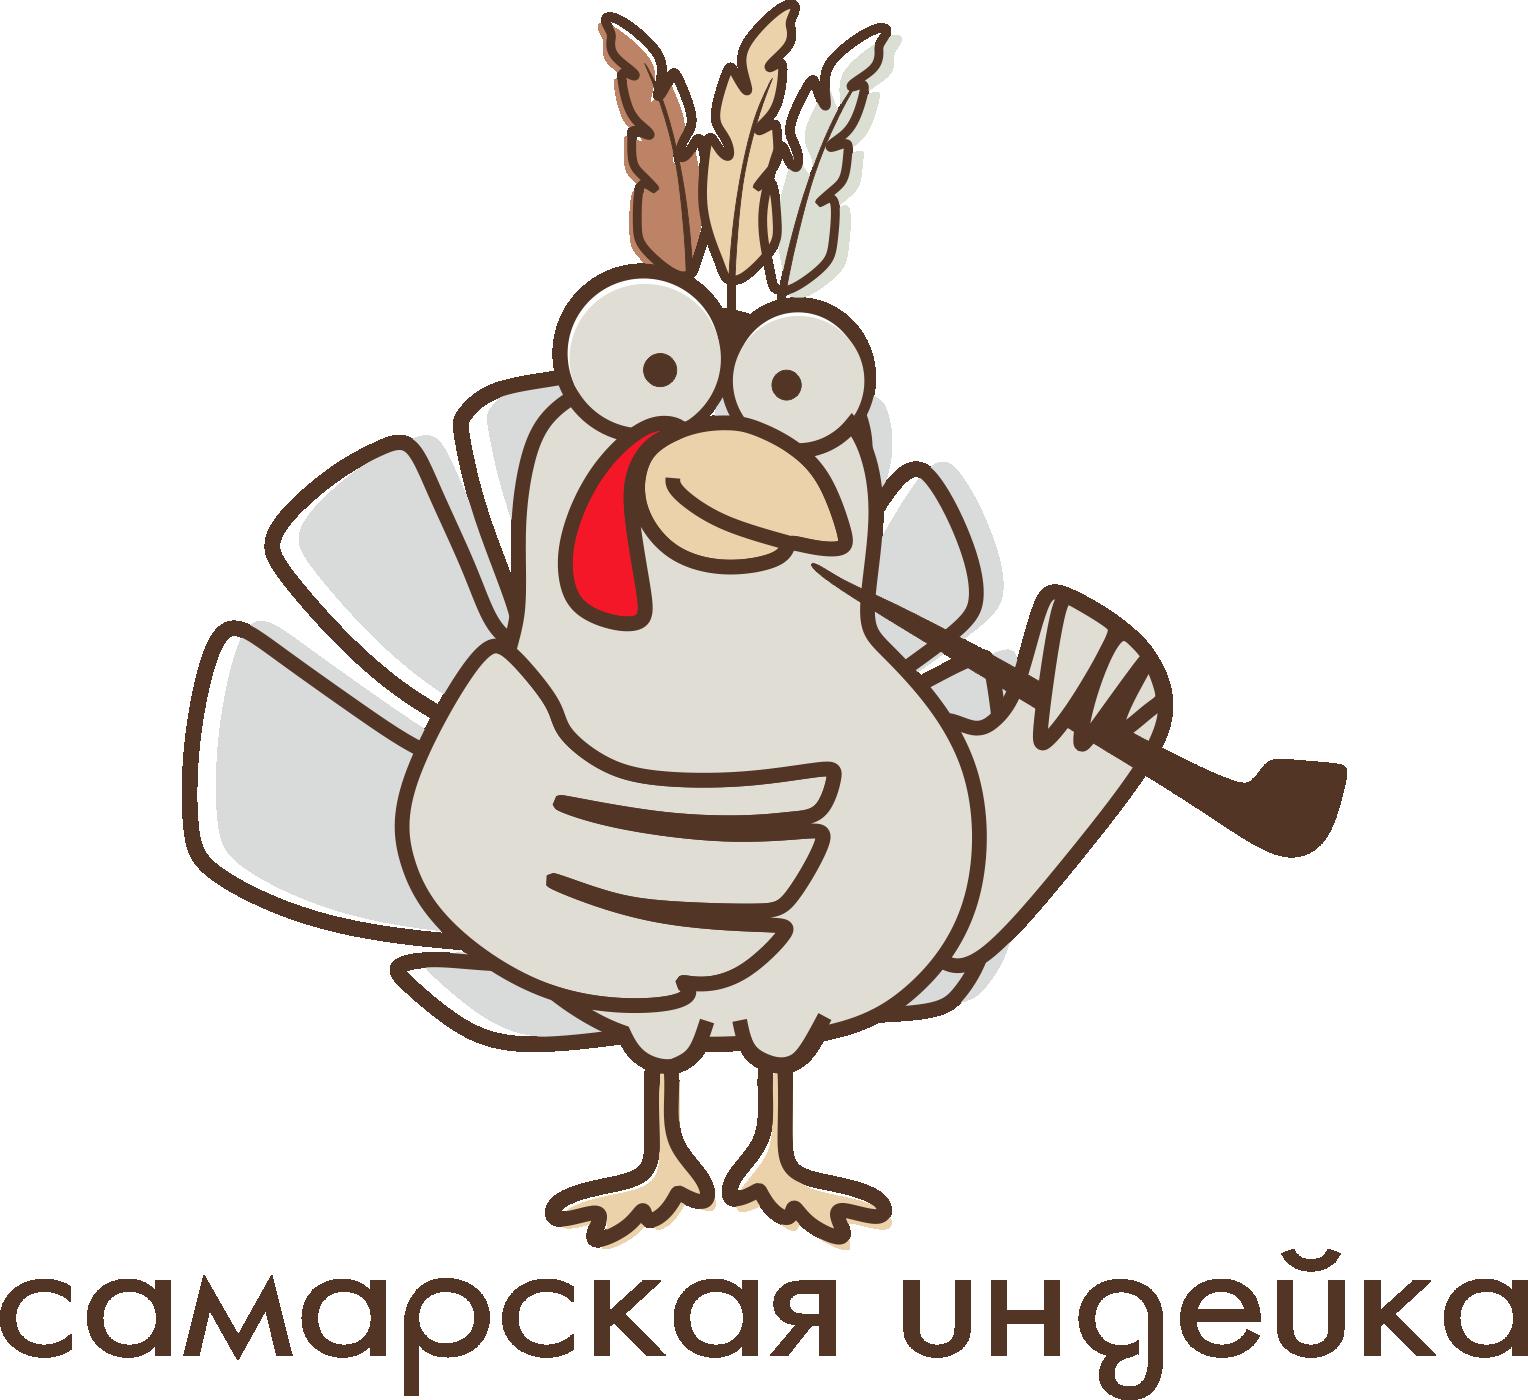 Создание логотипа Сельхоз производителя фото f_33455e1deaf955dd.png